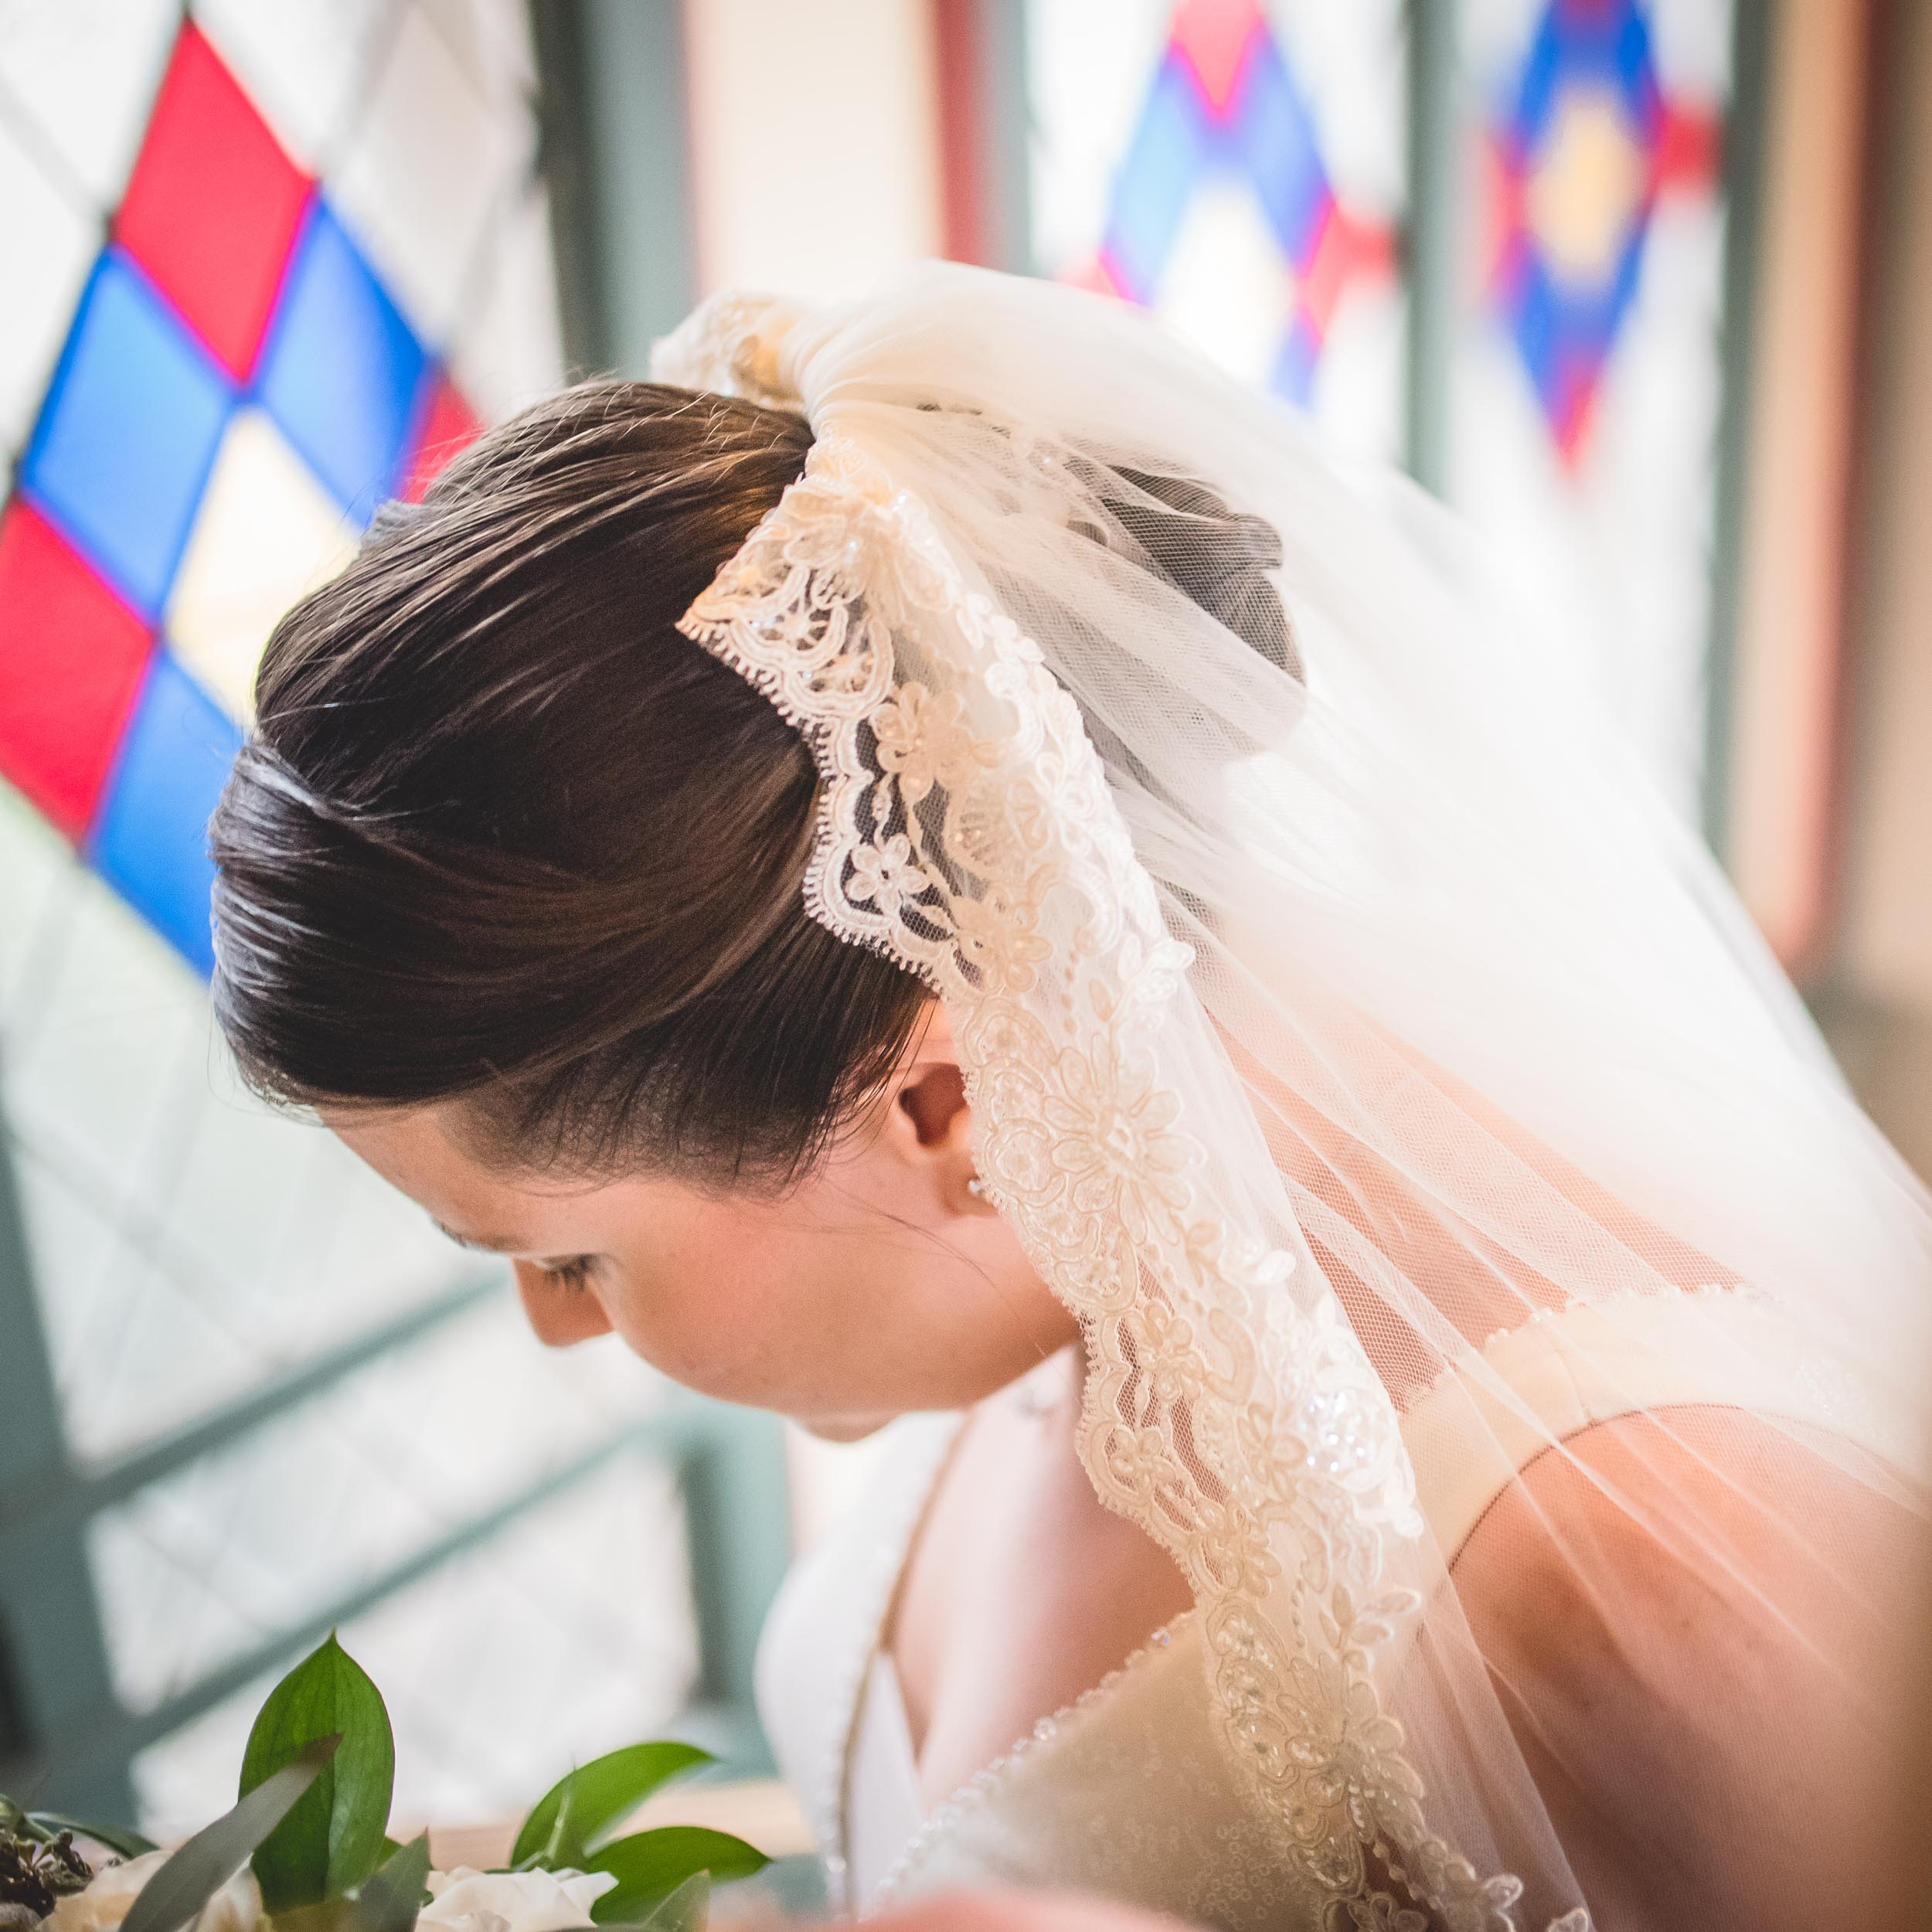 KatieandMathias_Morristown_NewJersey_Wedding_Church_Assumption_Madison_Hotel(28of65).jpg